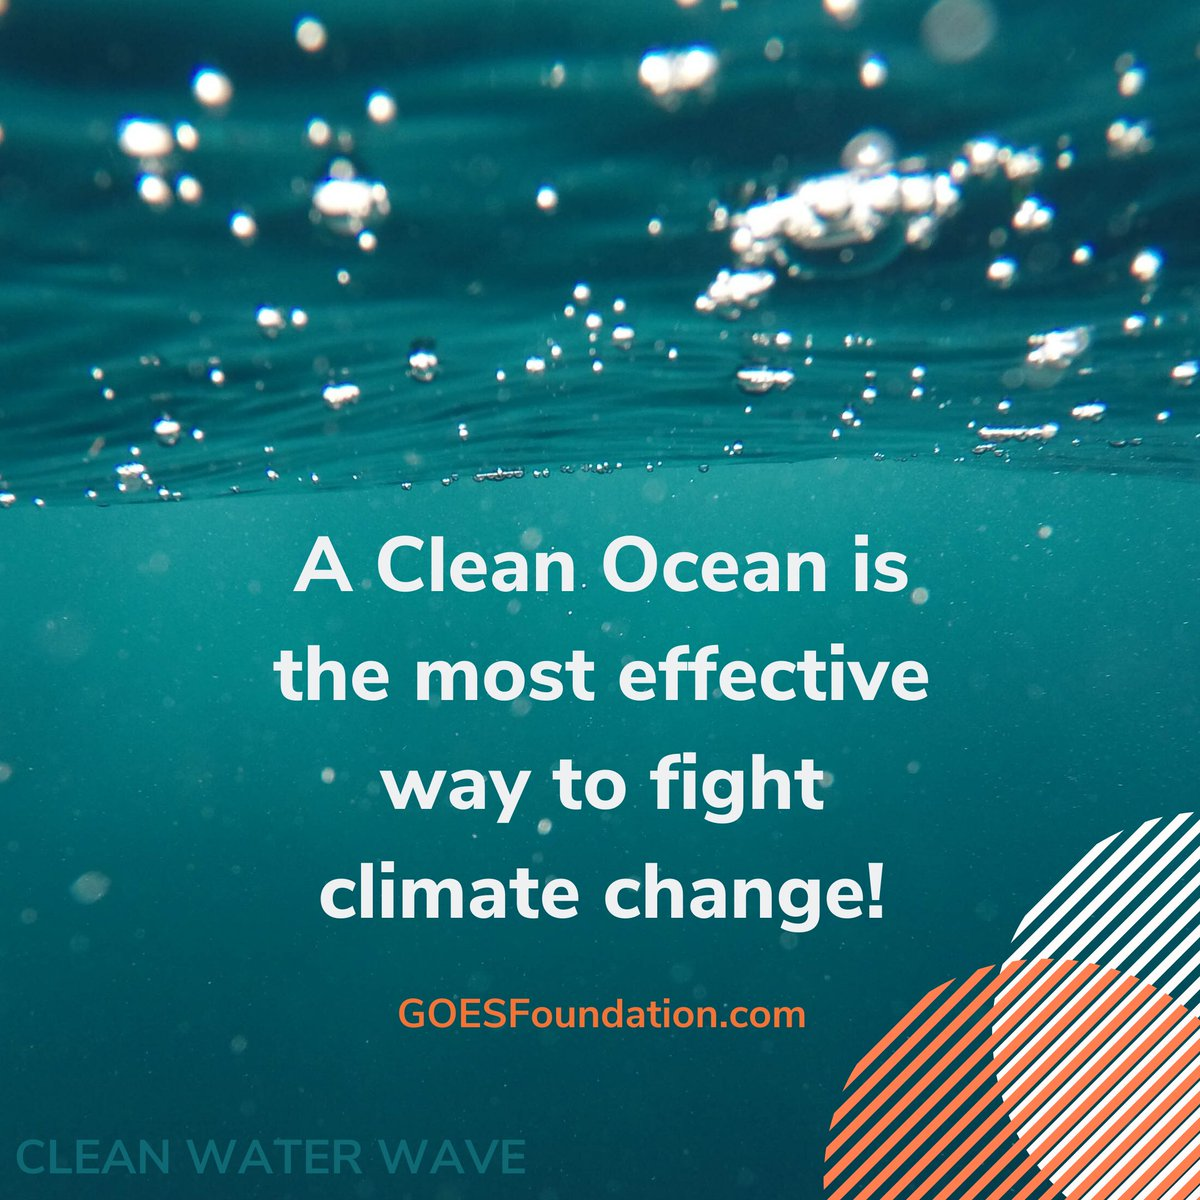 CleanWaterWave photo